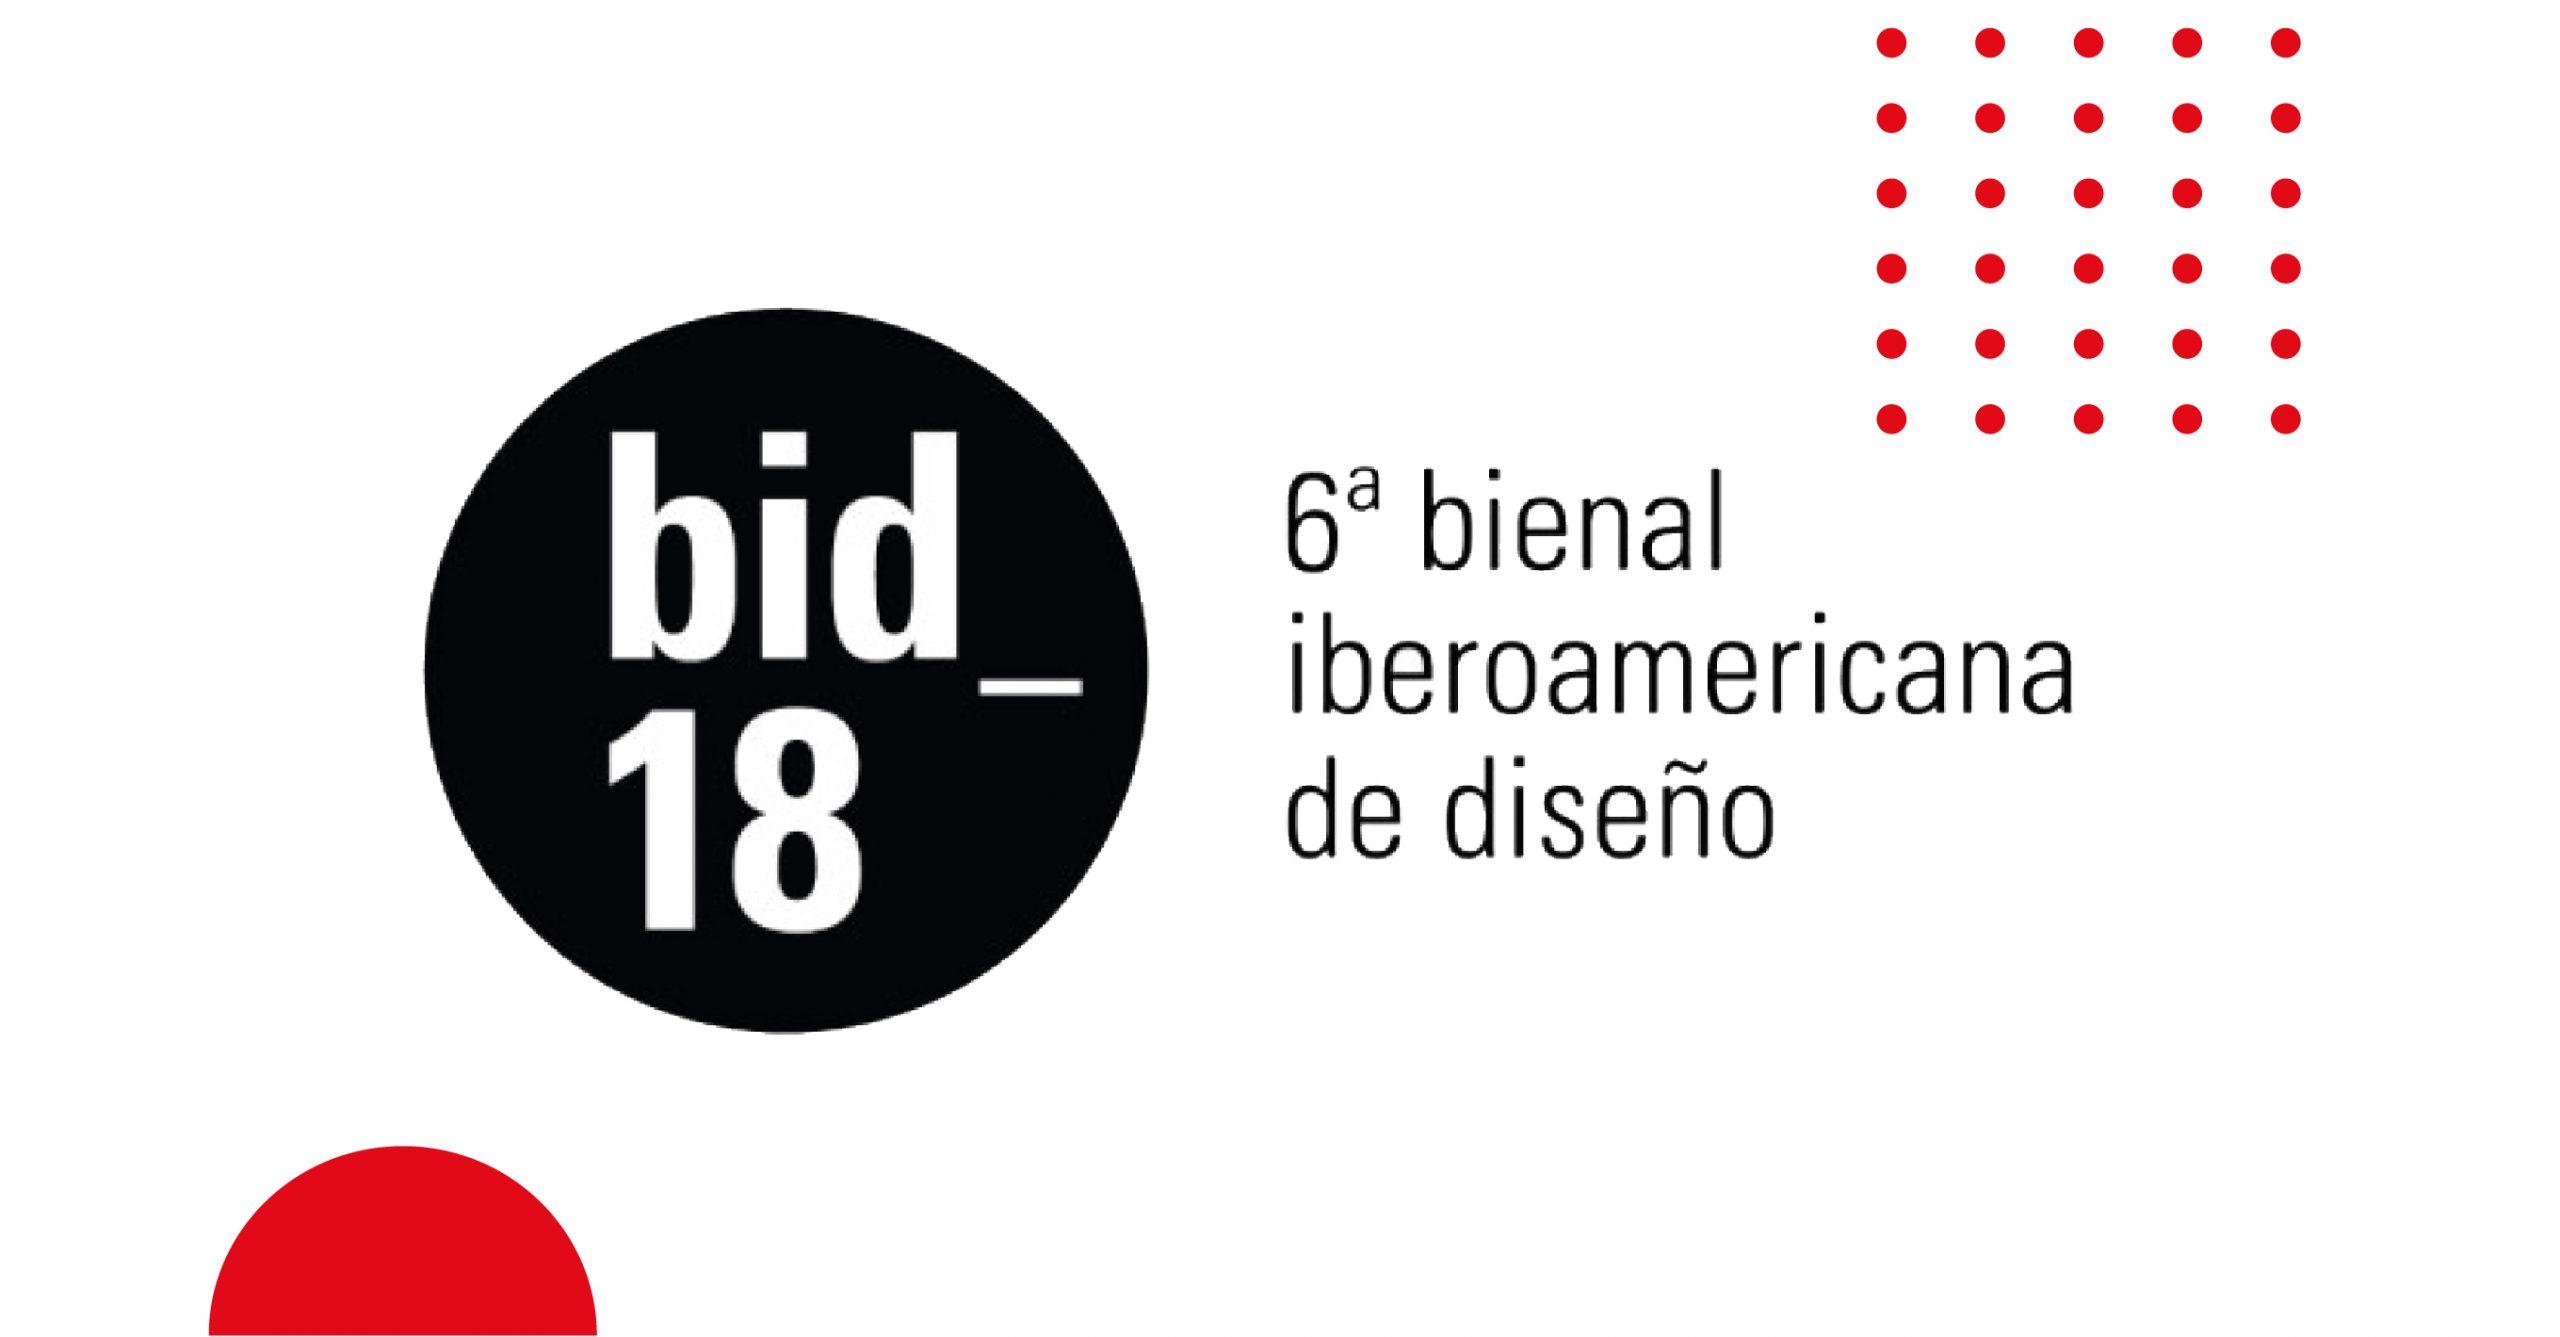 BIENAL IBEROAMERICANA DE DISEÑO 2018